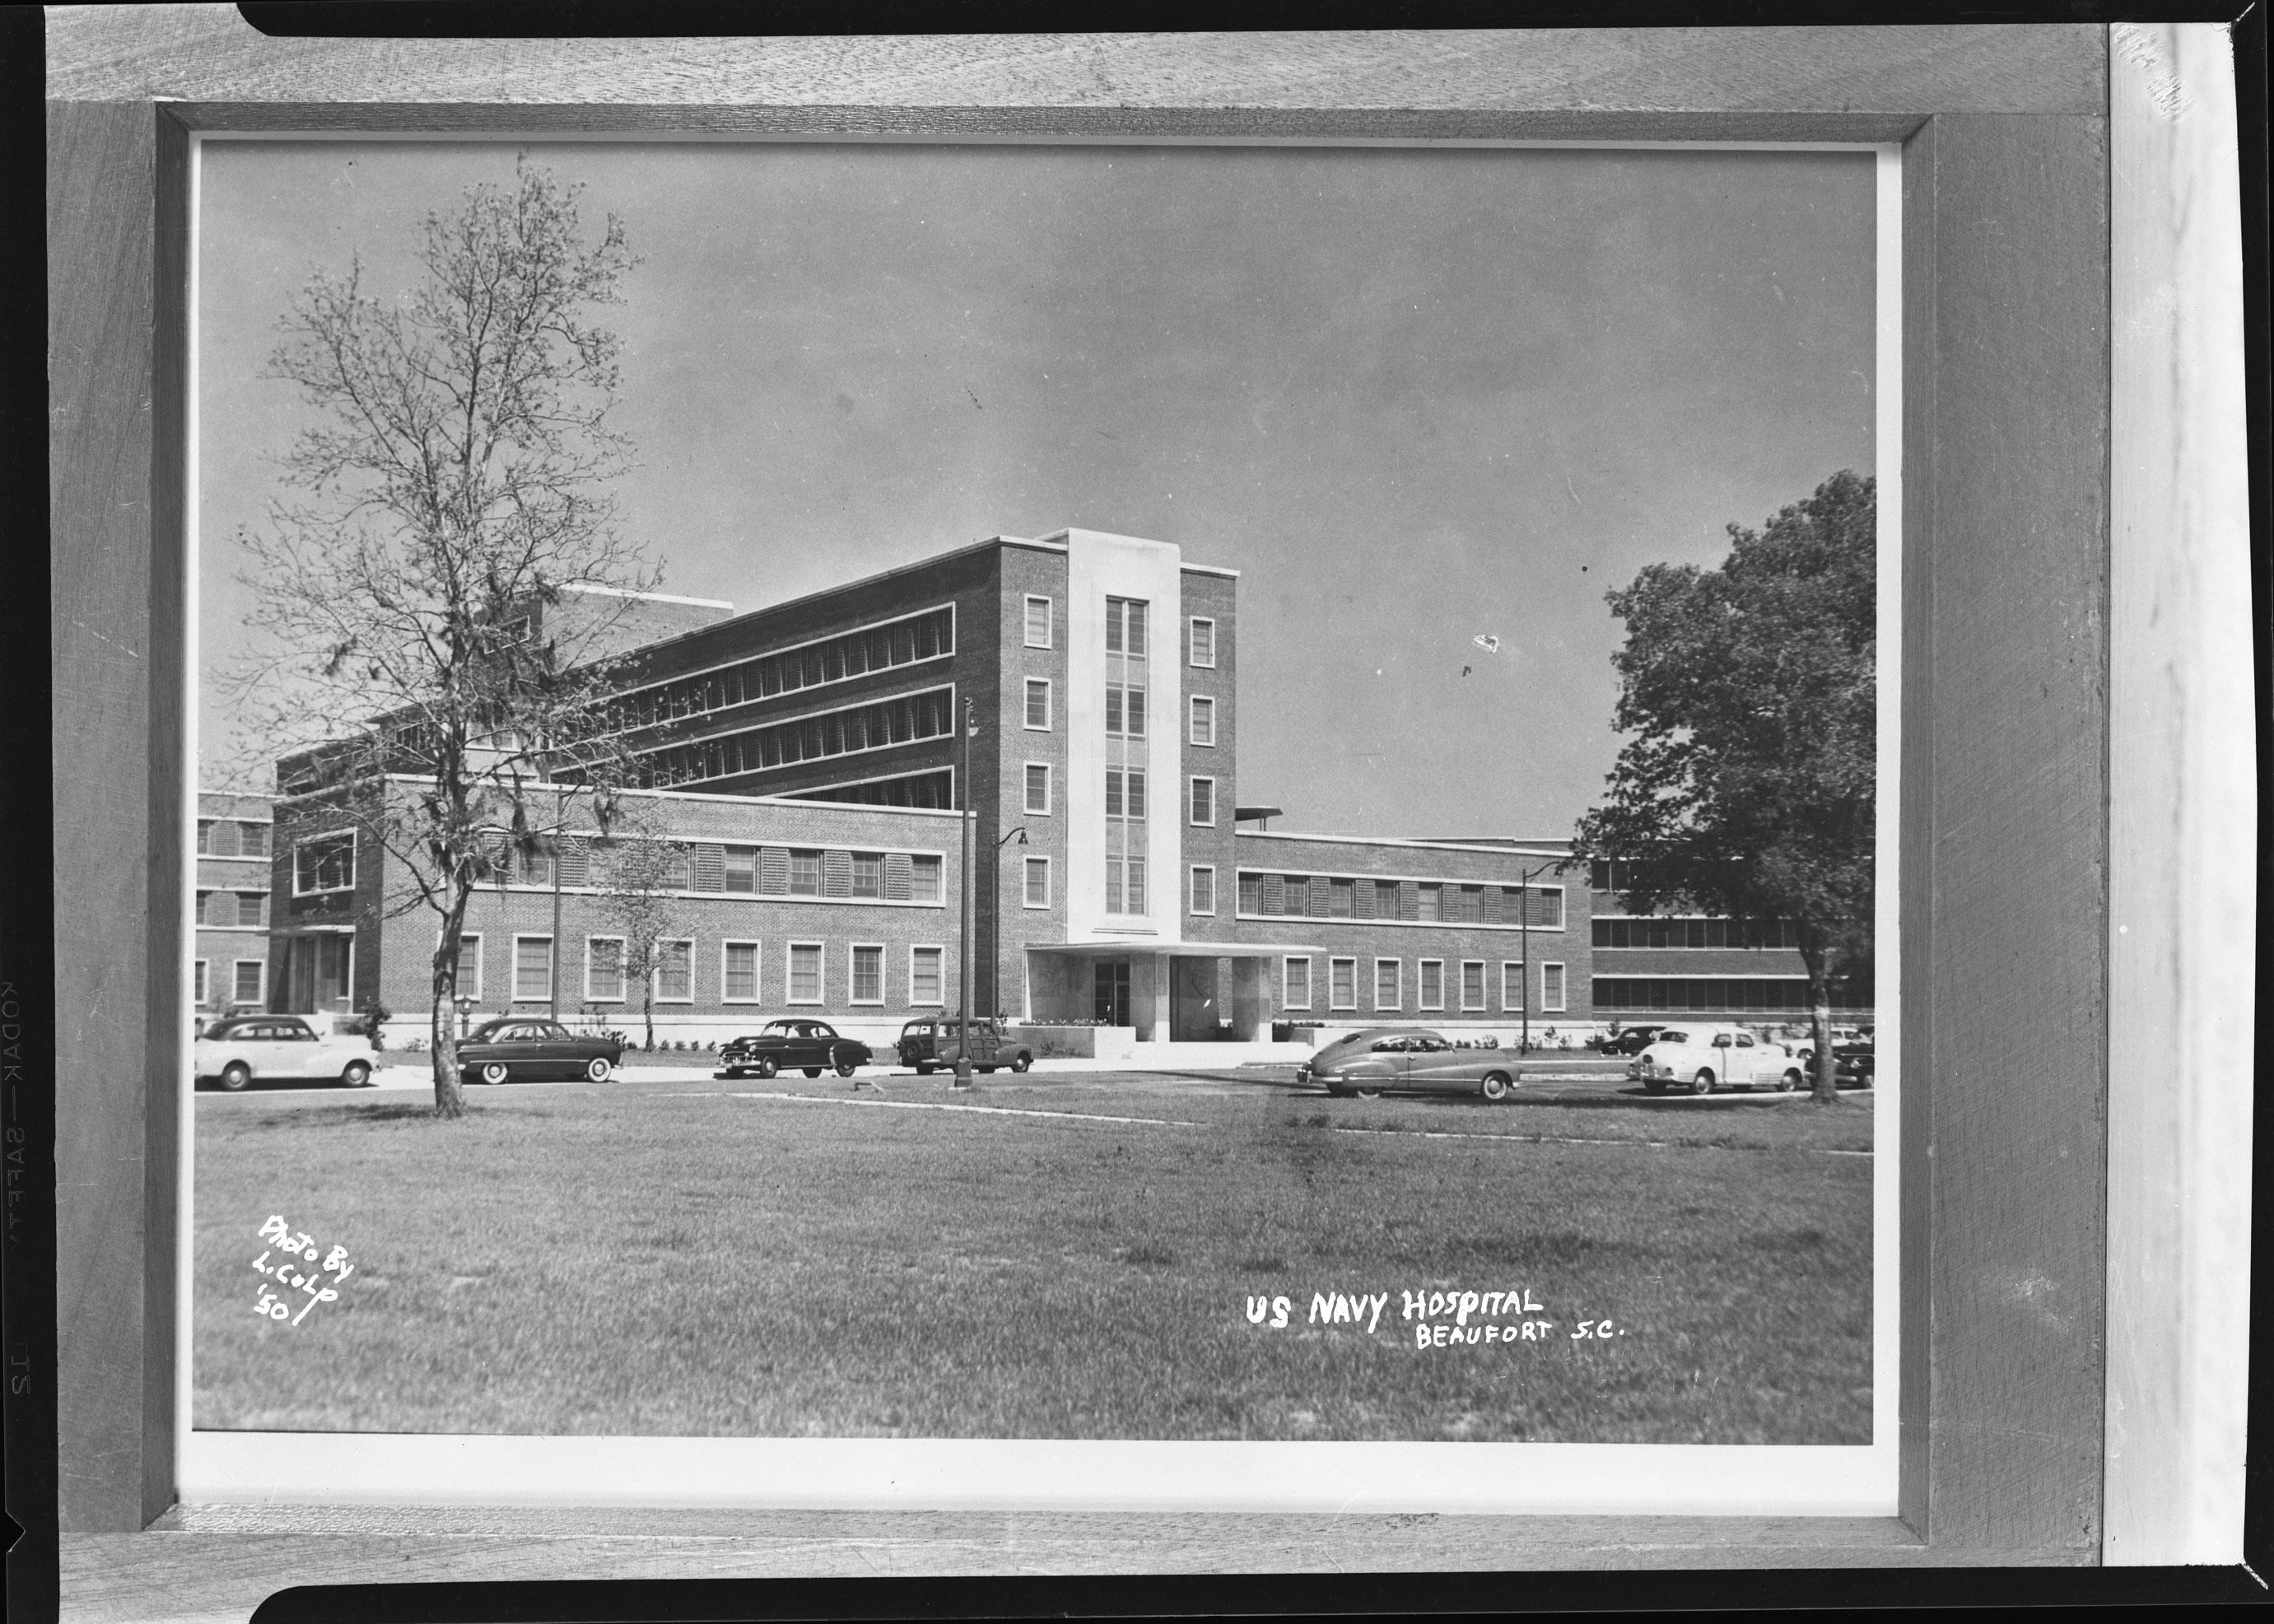 U.S Navy Hospital Beaufort, S.C.